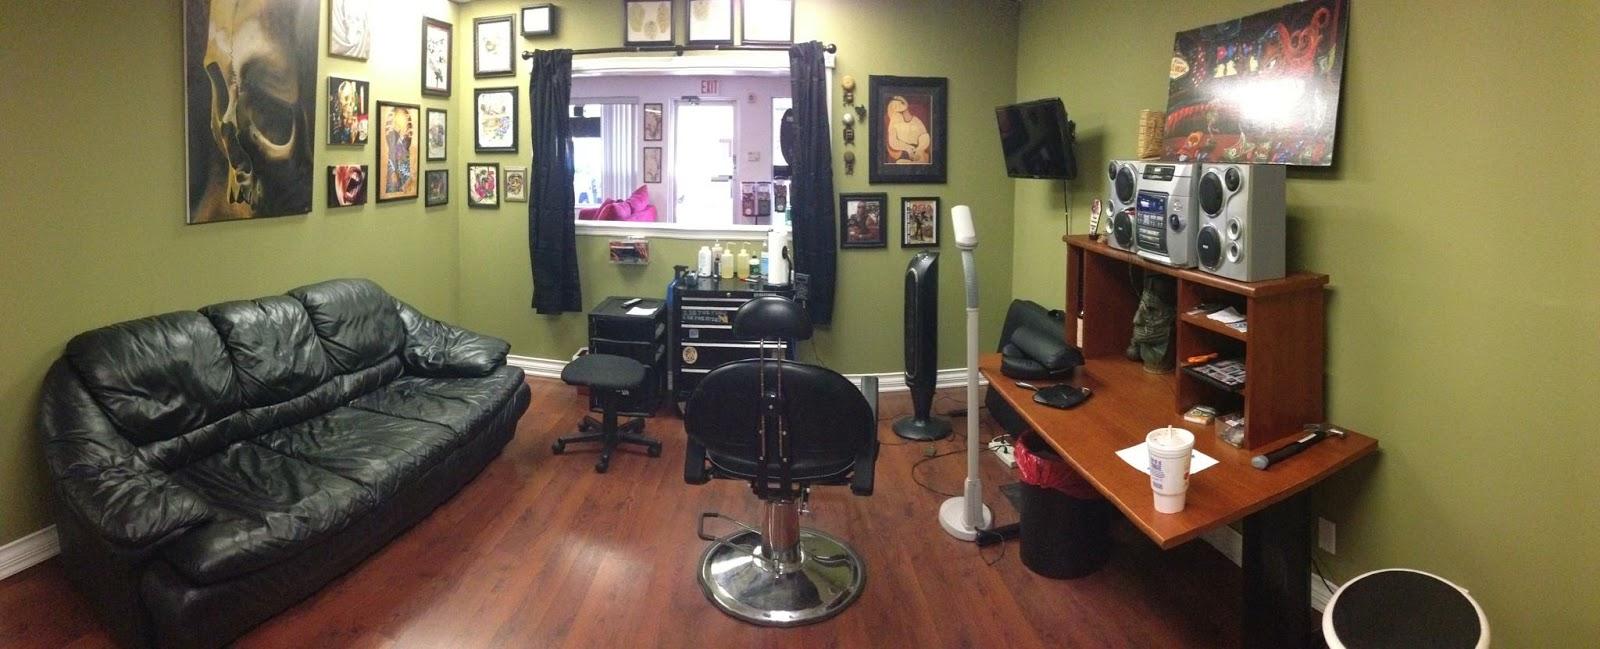 ea624aa05 Lollis Studios Tattoo Company, 6537 Park Boulevard North, Pinellas ...